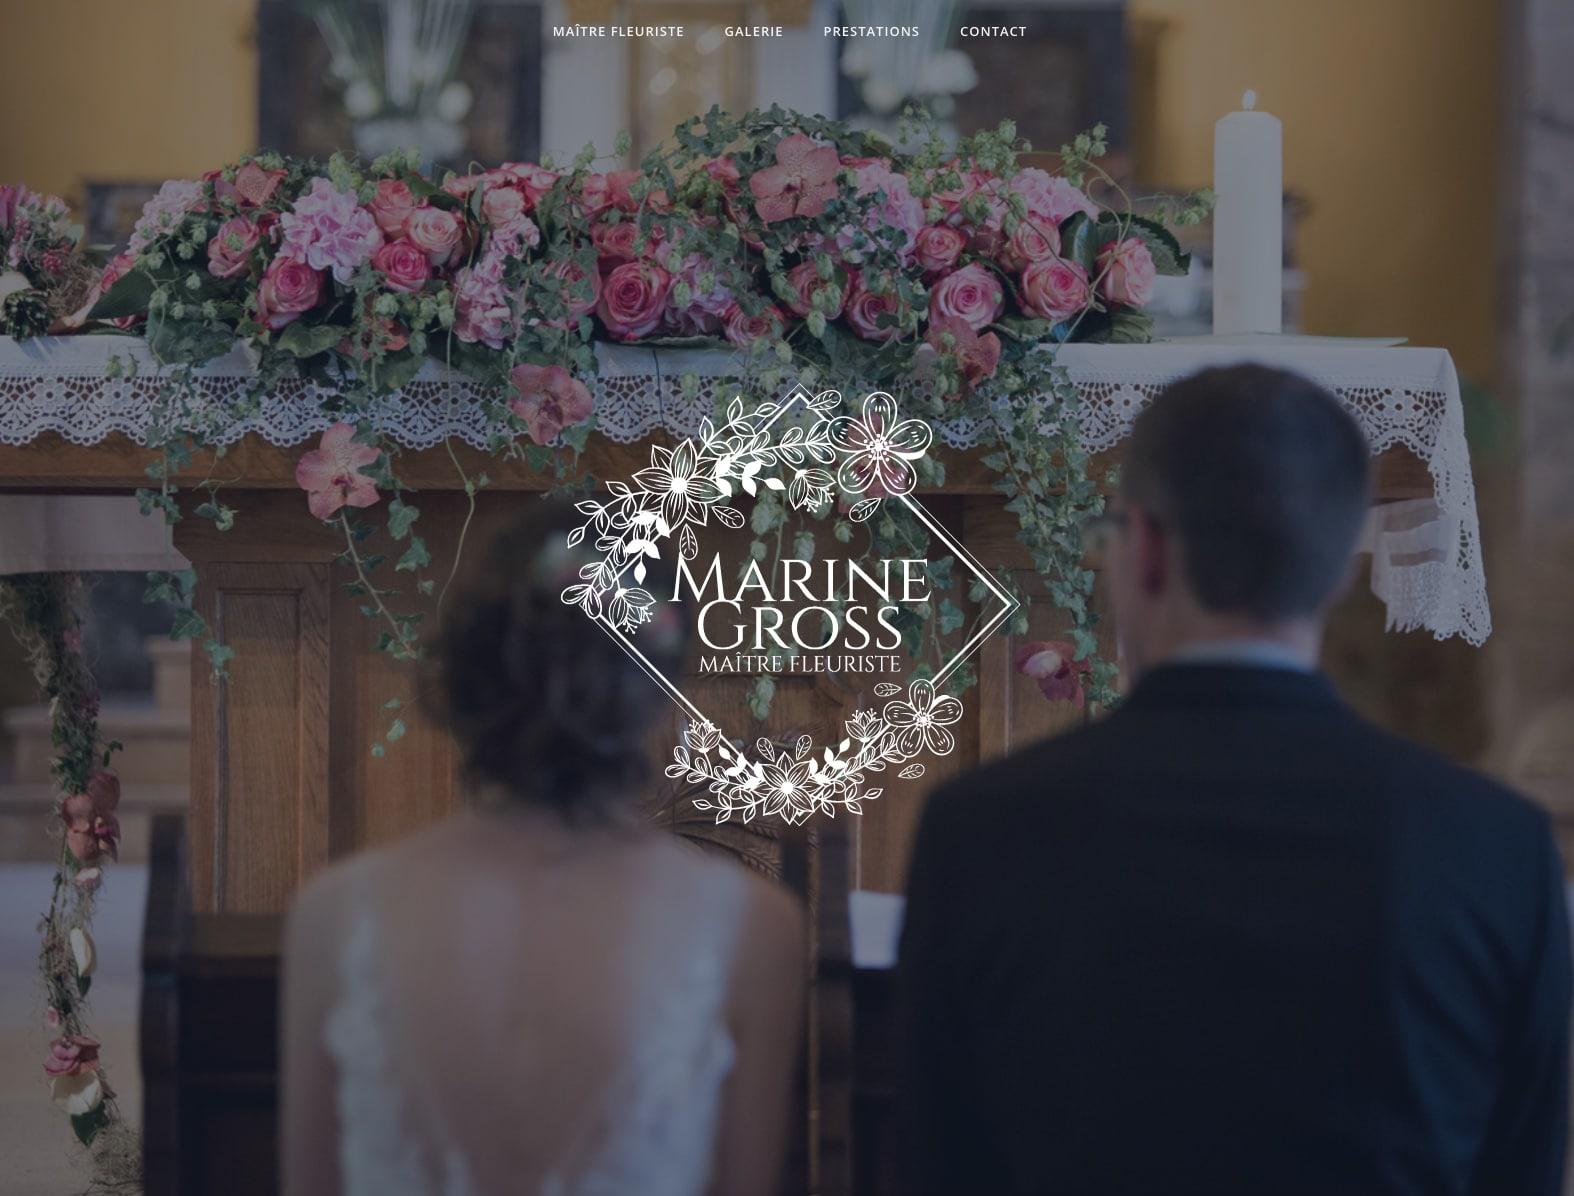 Marine Gross, maître fleuriste cliente de l'agence Karedess, agence digitale sur Mulhouse